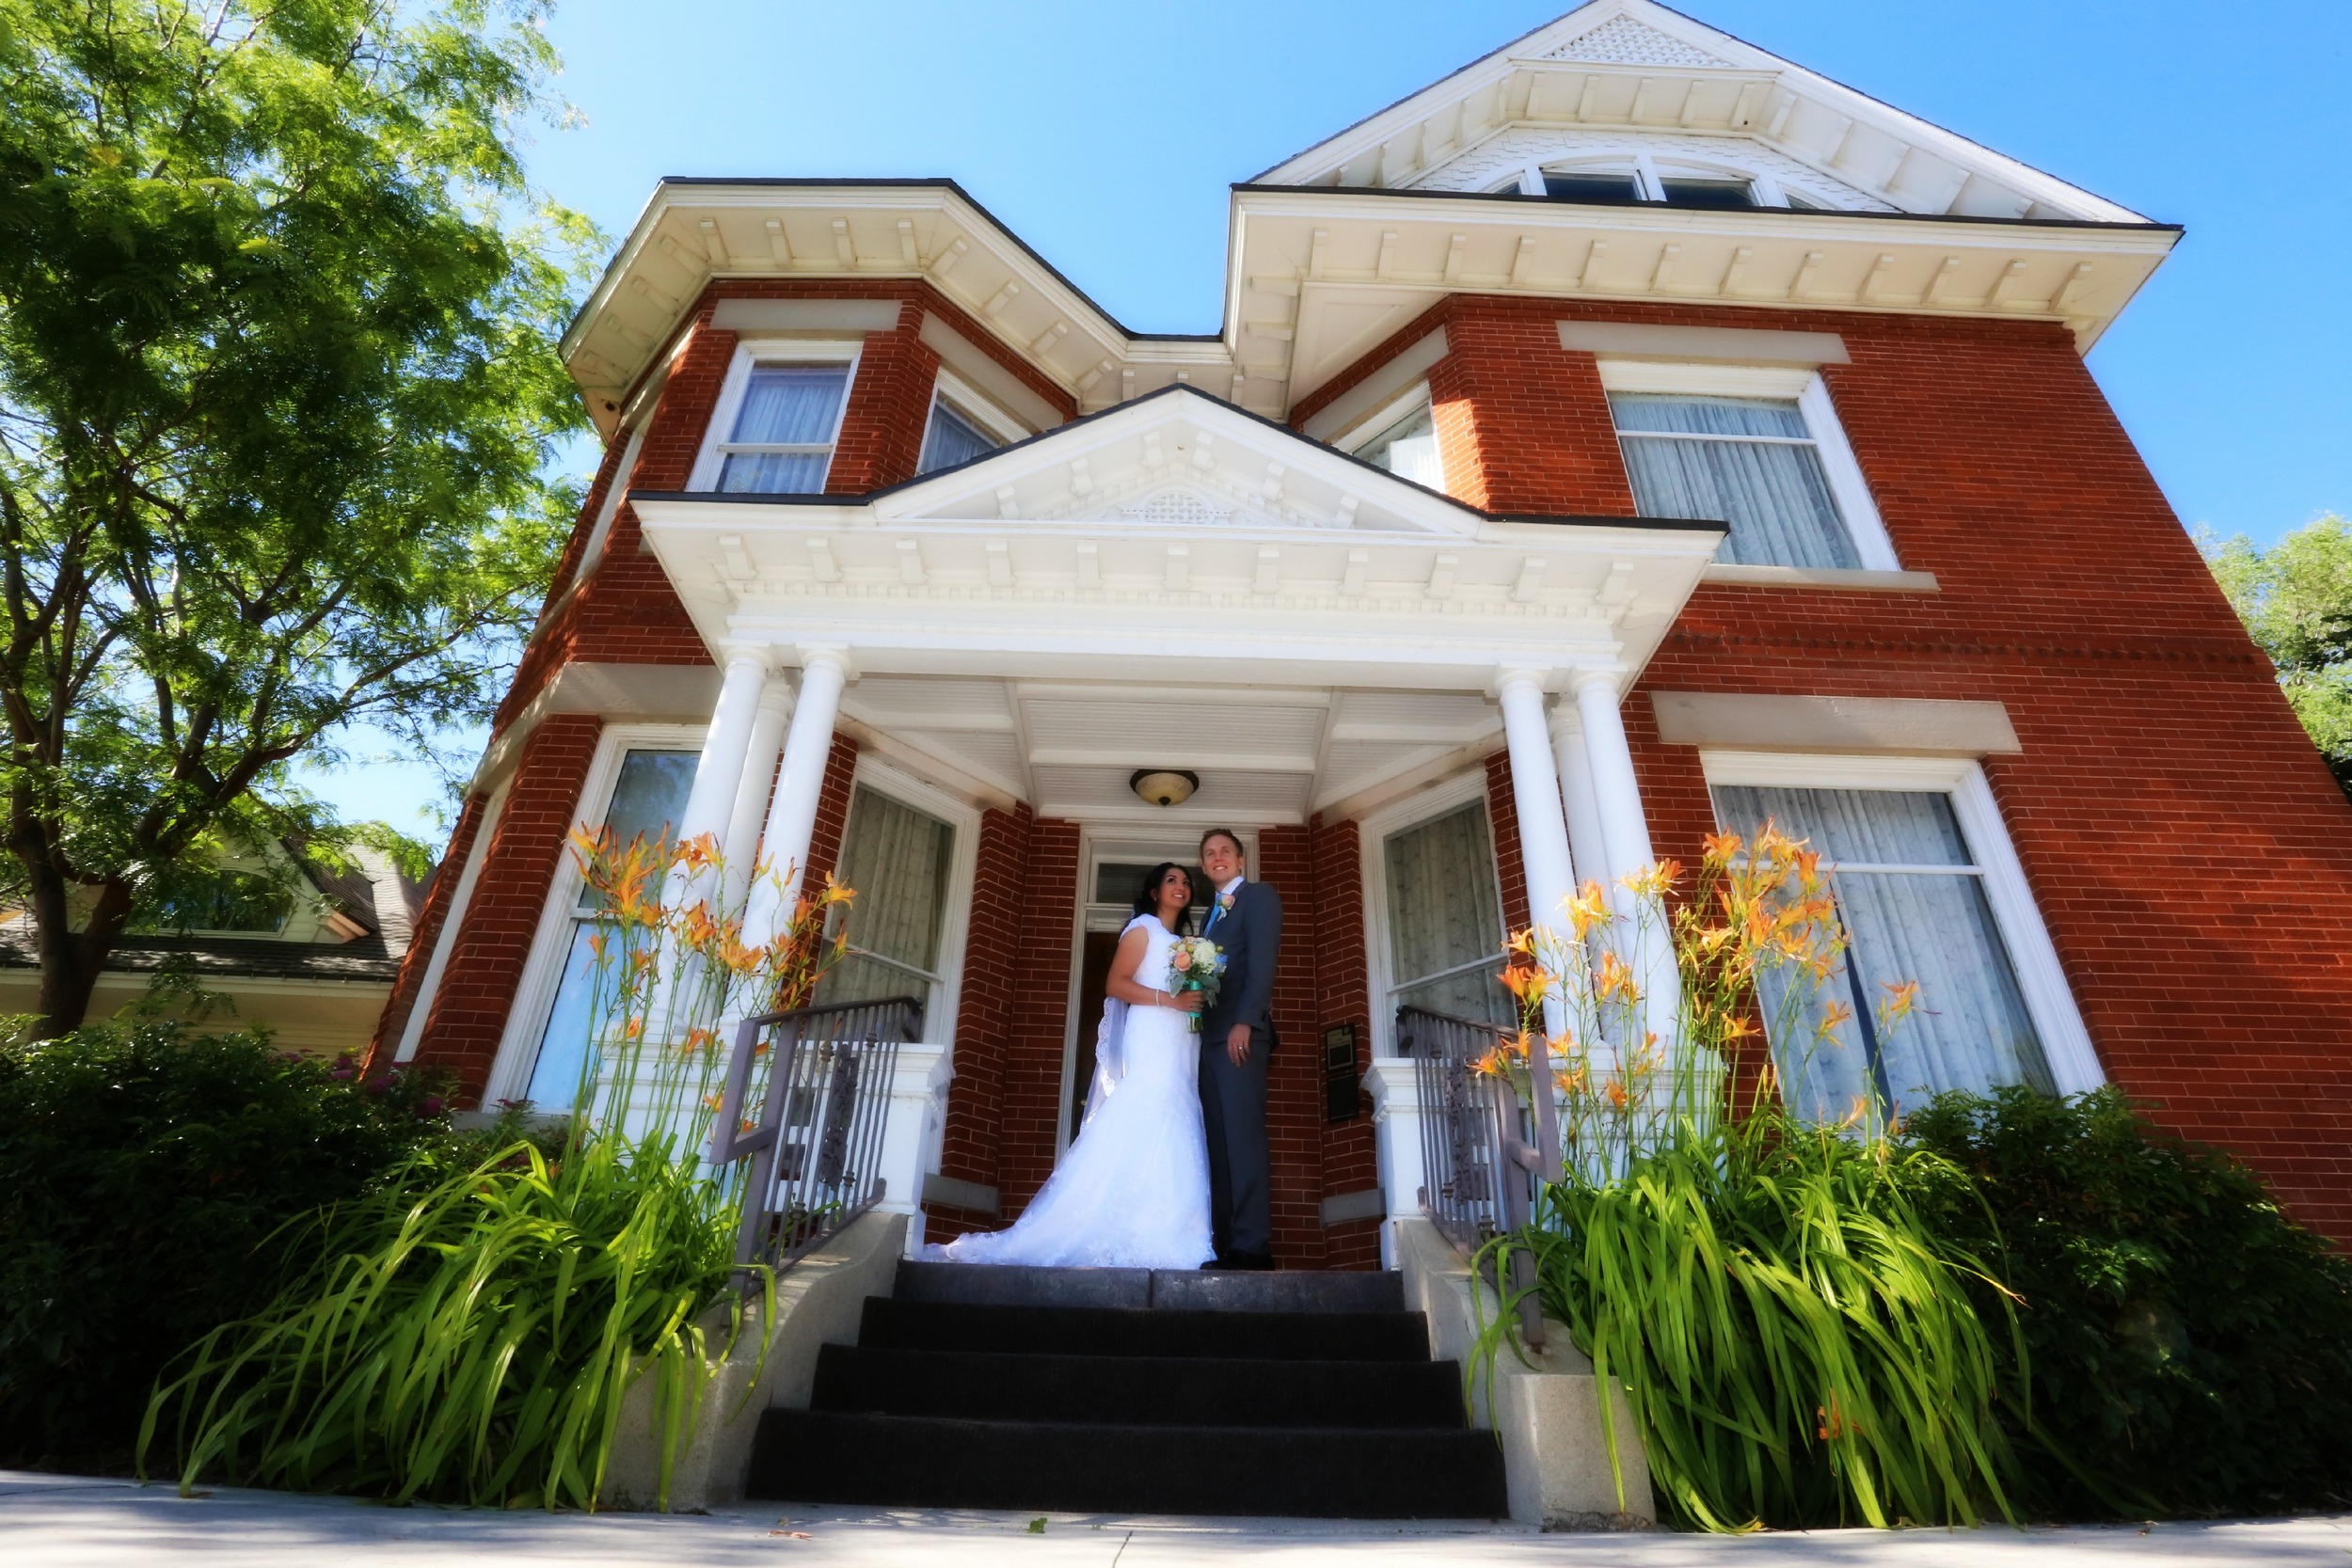 Wedding photography in Bountiful wedding reception center